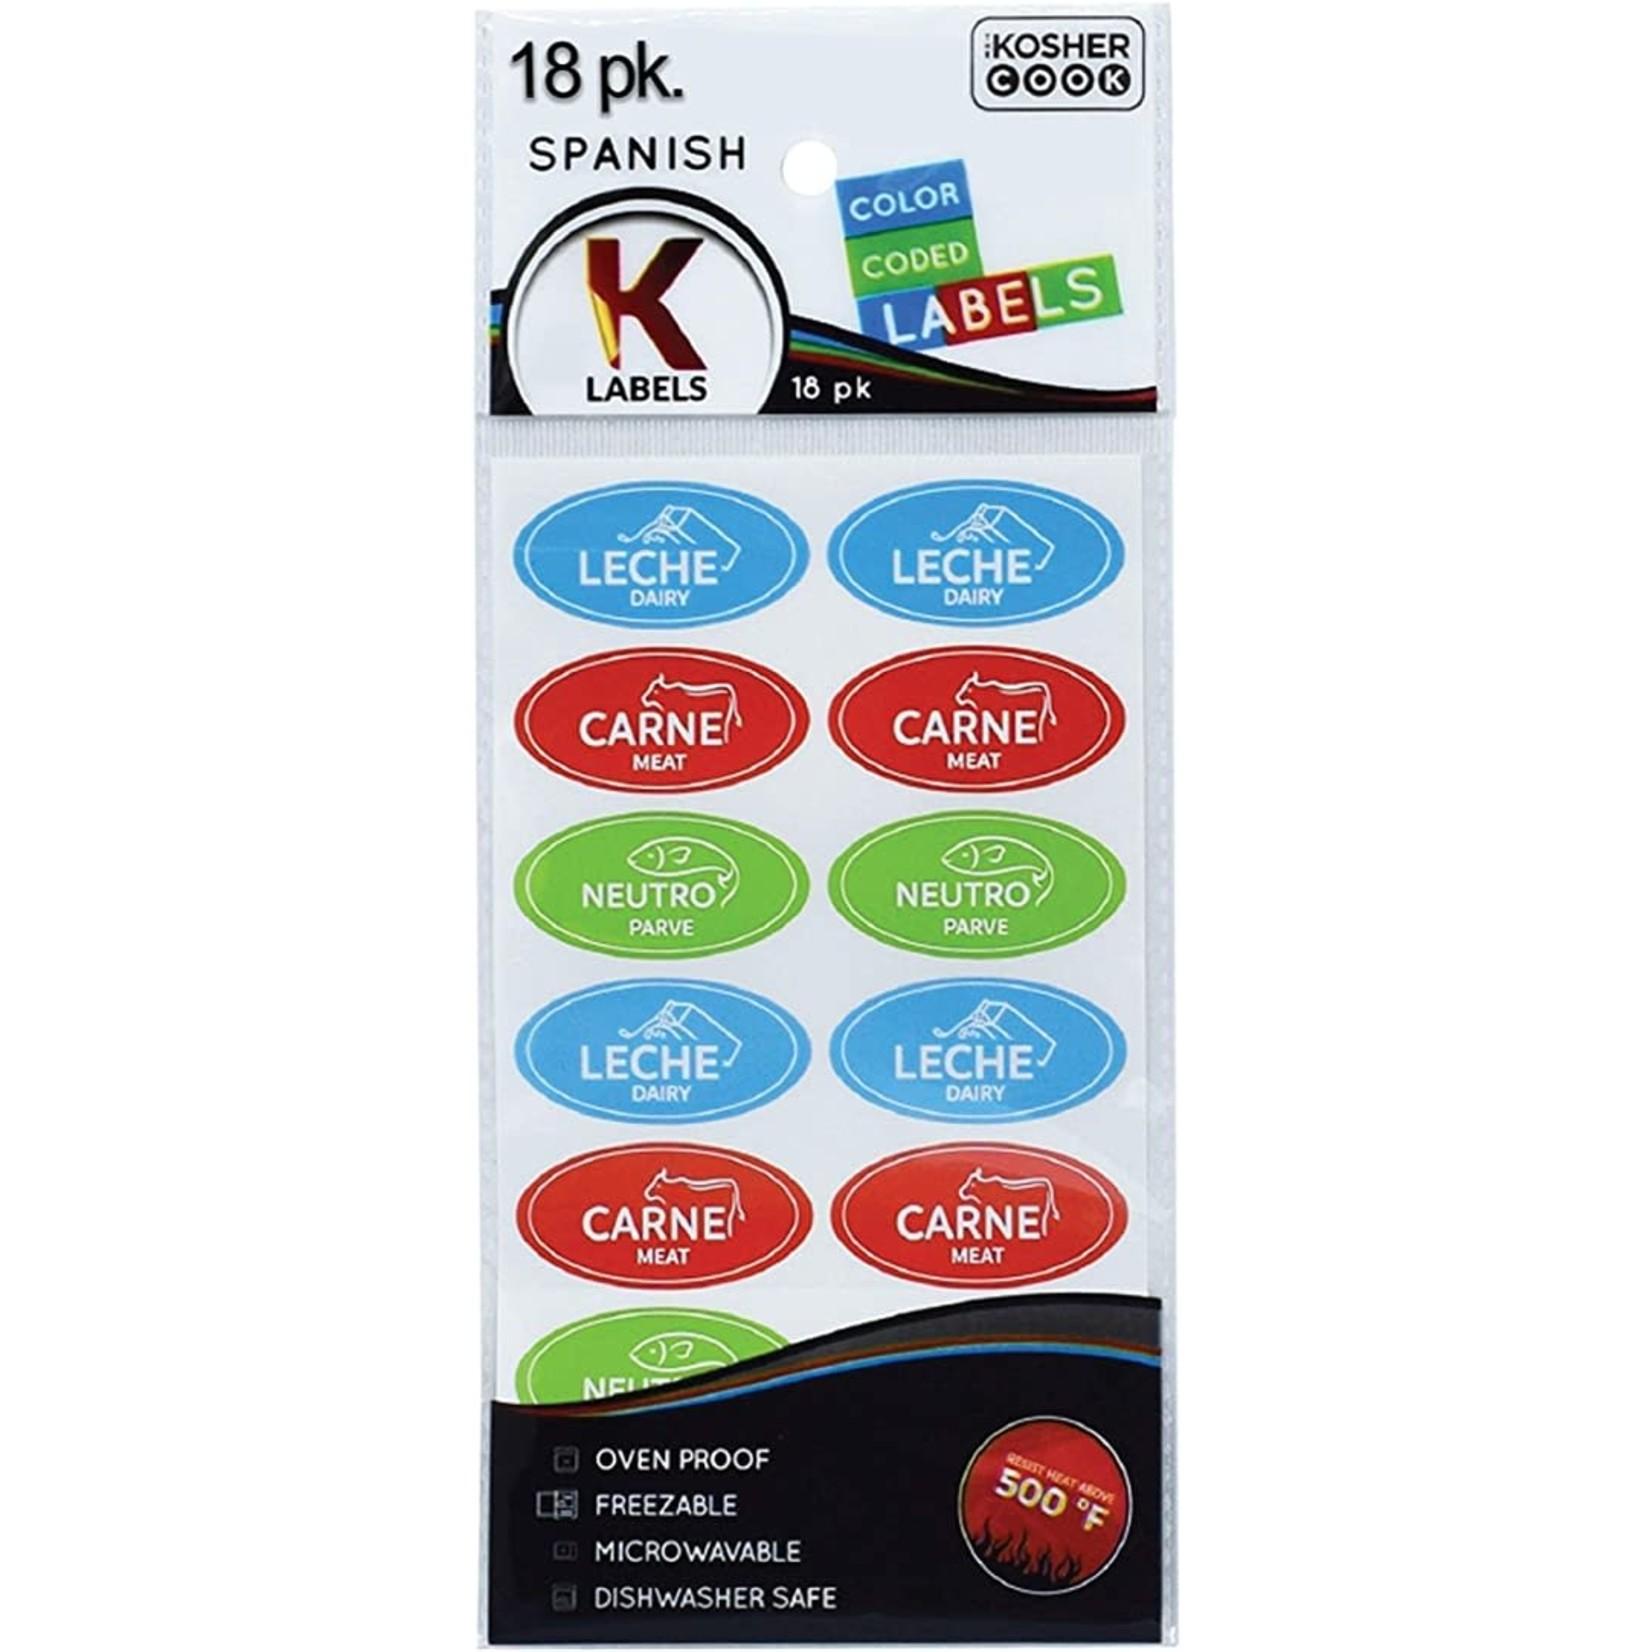 05409 Kosher Labels18pk. Spanish - Assorted